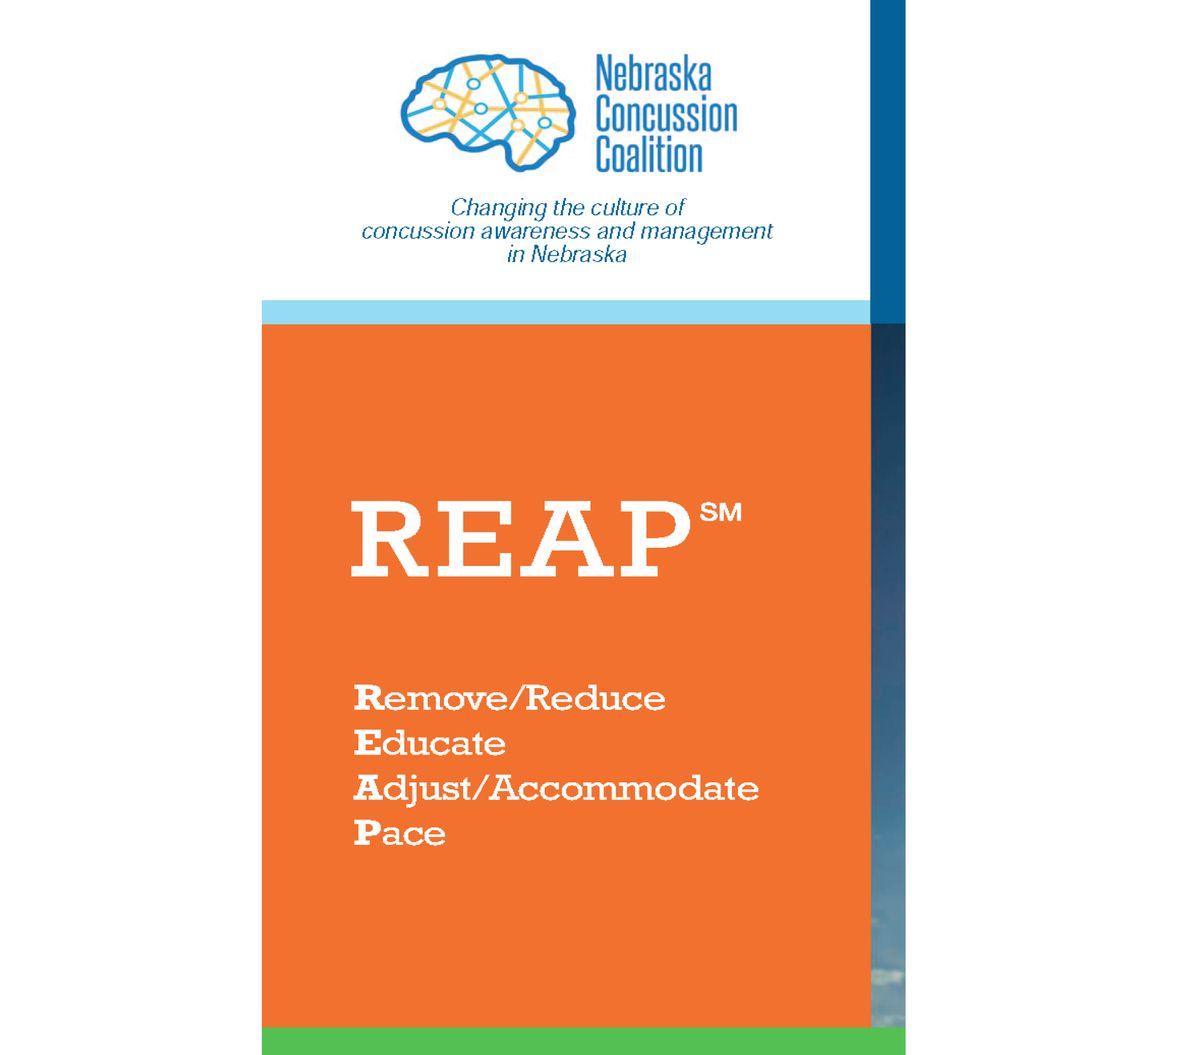 Reap Manual Cover